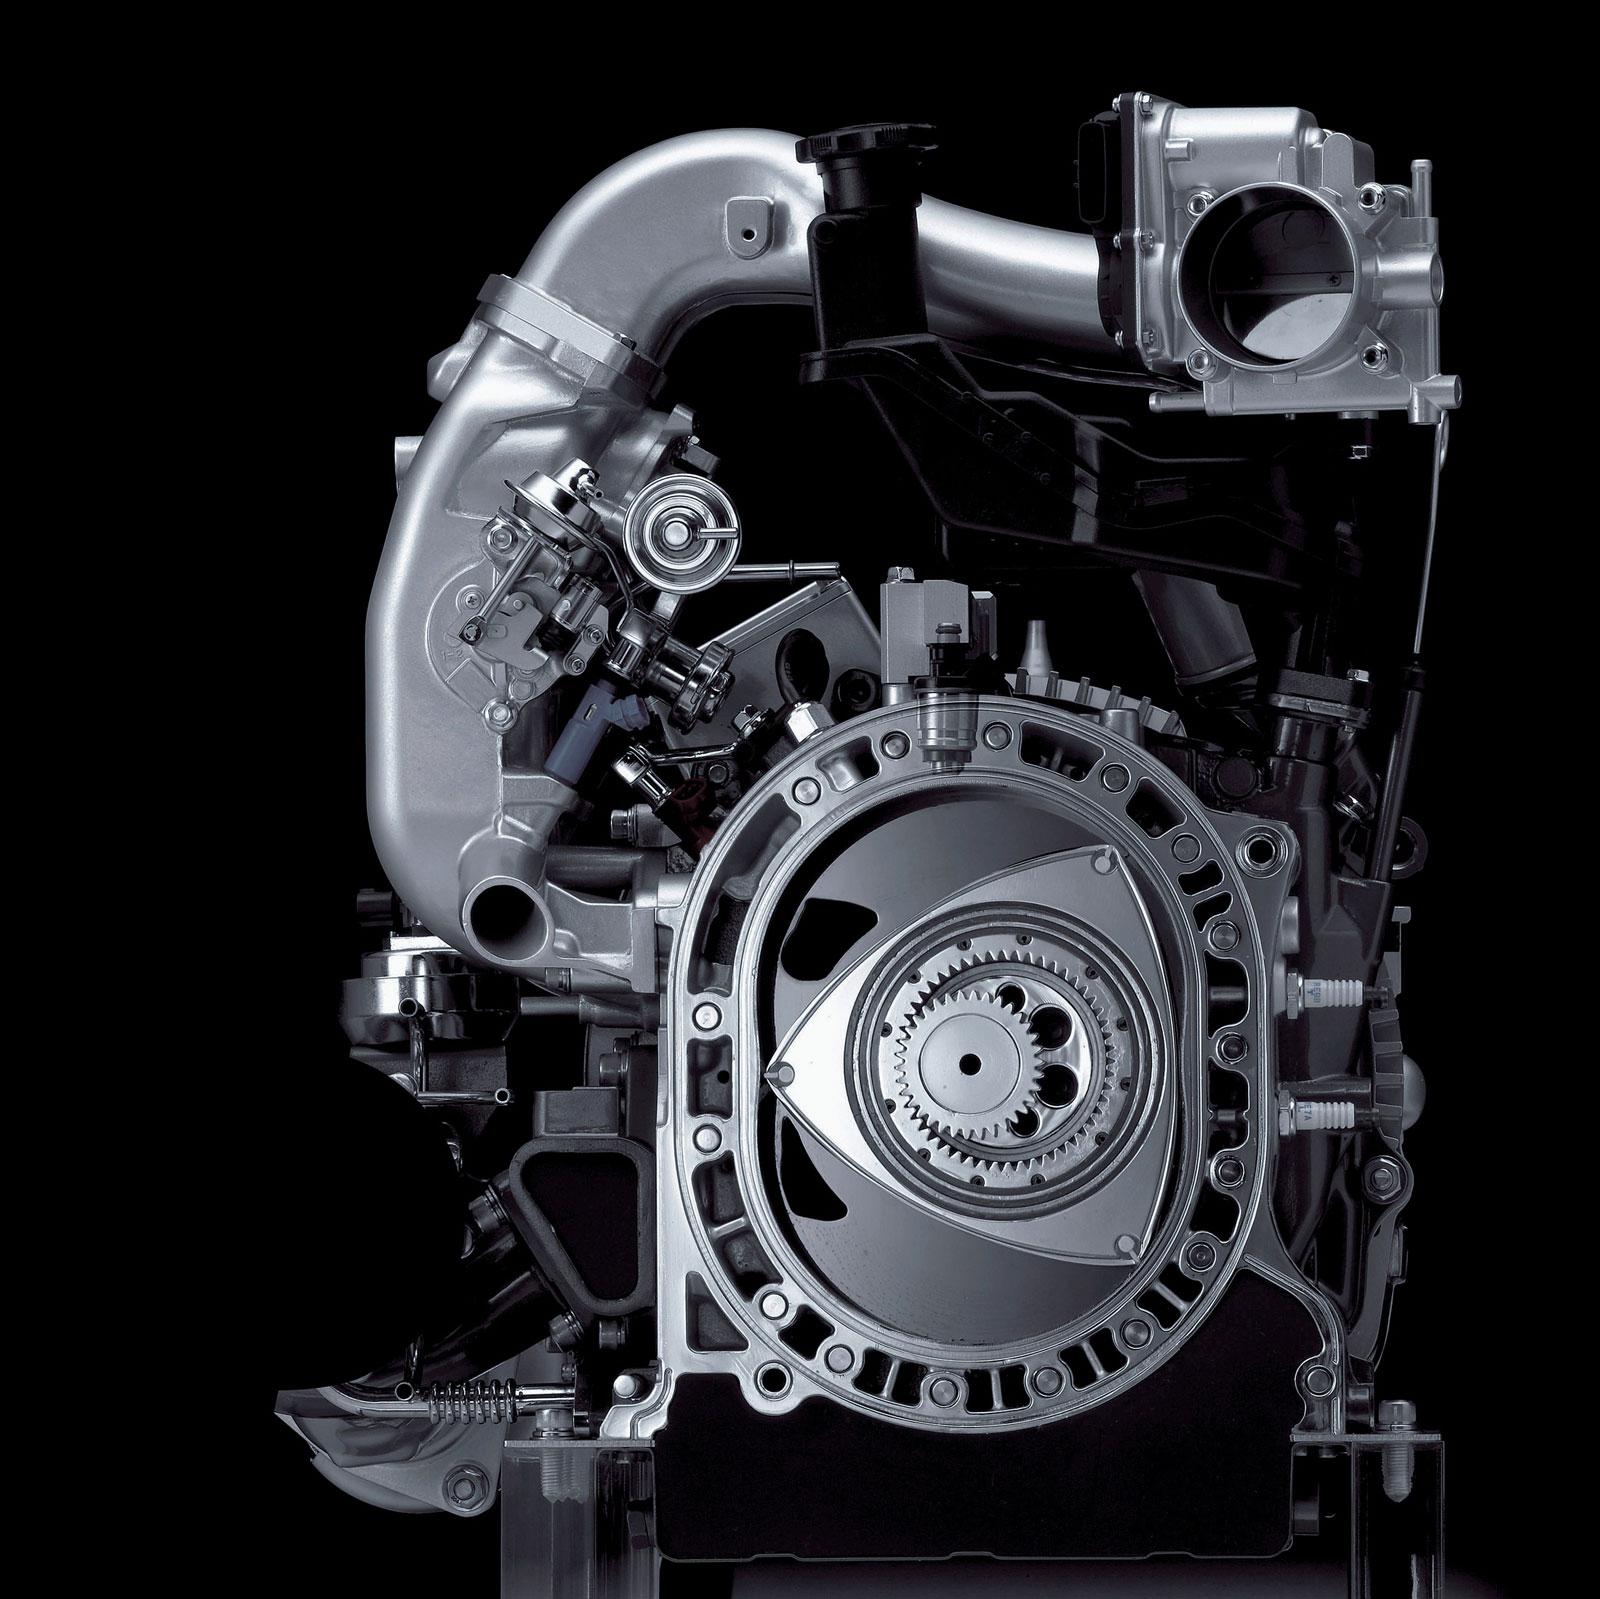 Mazda RX 8 RENESIS Rotary engine and powertrain - Car Body